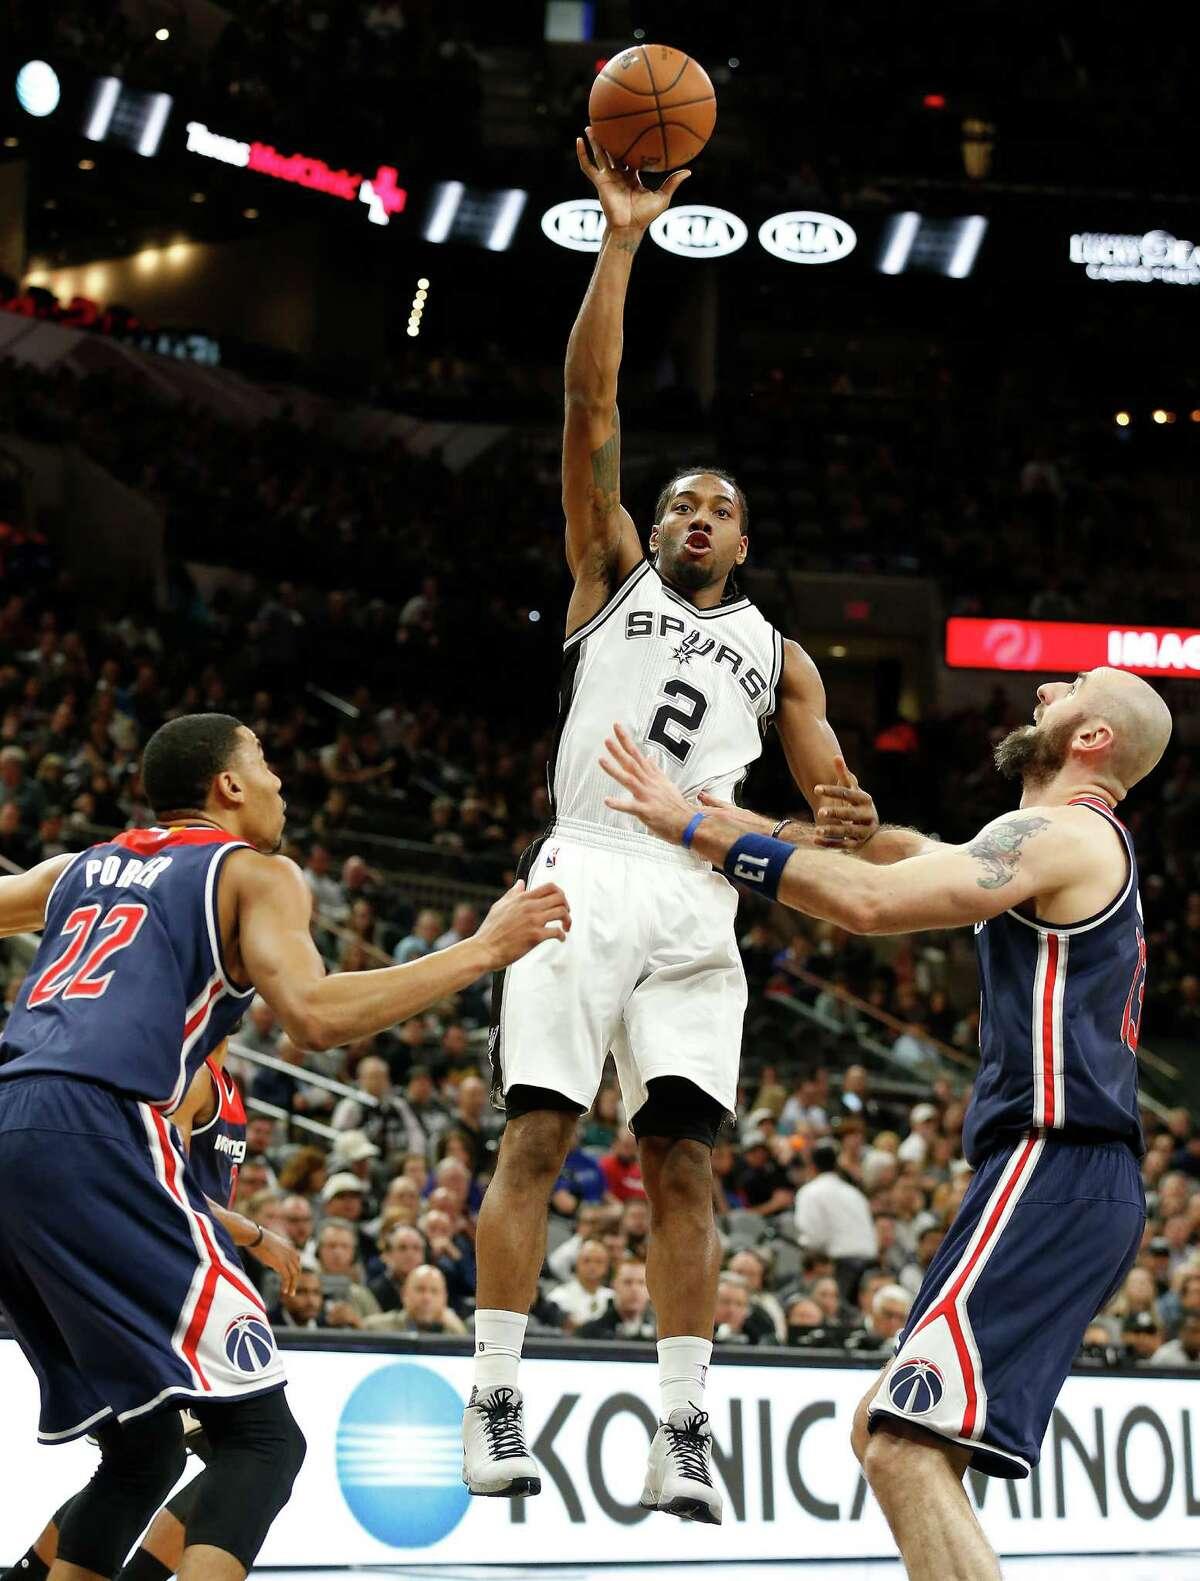 Spurs' Kawhi Leonard (02) takes a shot against Washington Wizards' Otto Porter Jr. (22) and Marcin Gortat (13) at the AT&T Center on Wednesday, Dec. 16, 2015. (Kin Man Hui/San Antonio Express-News)